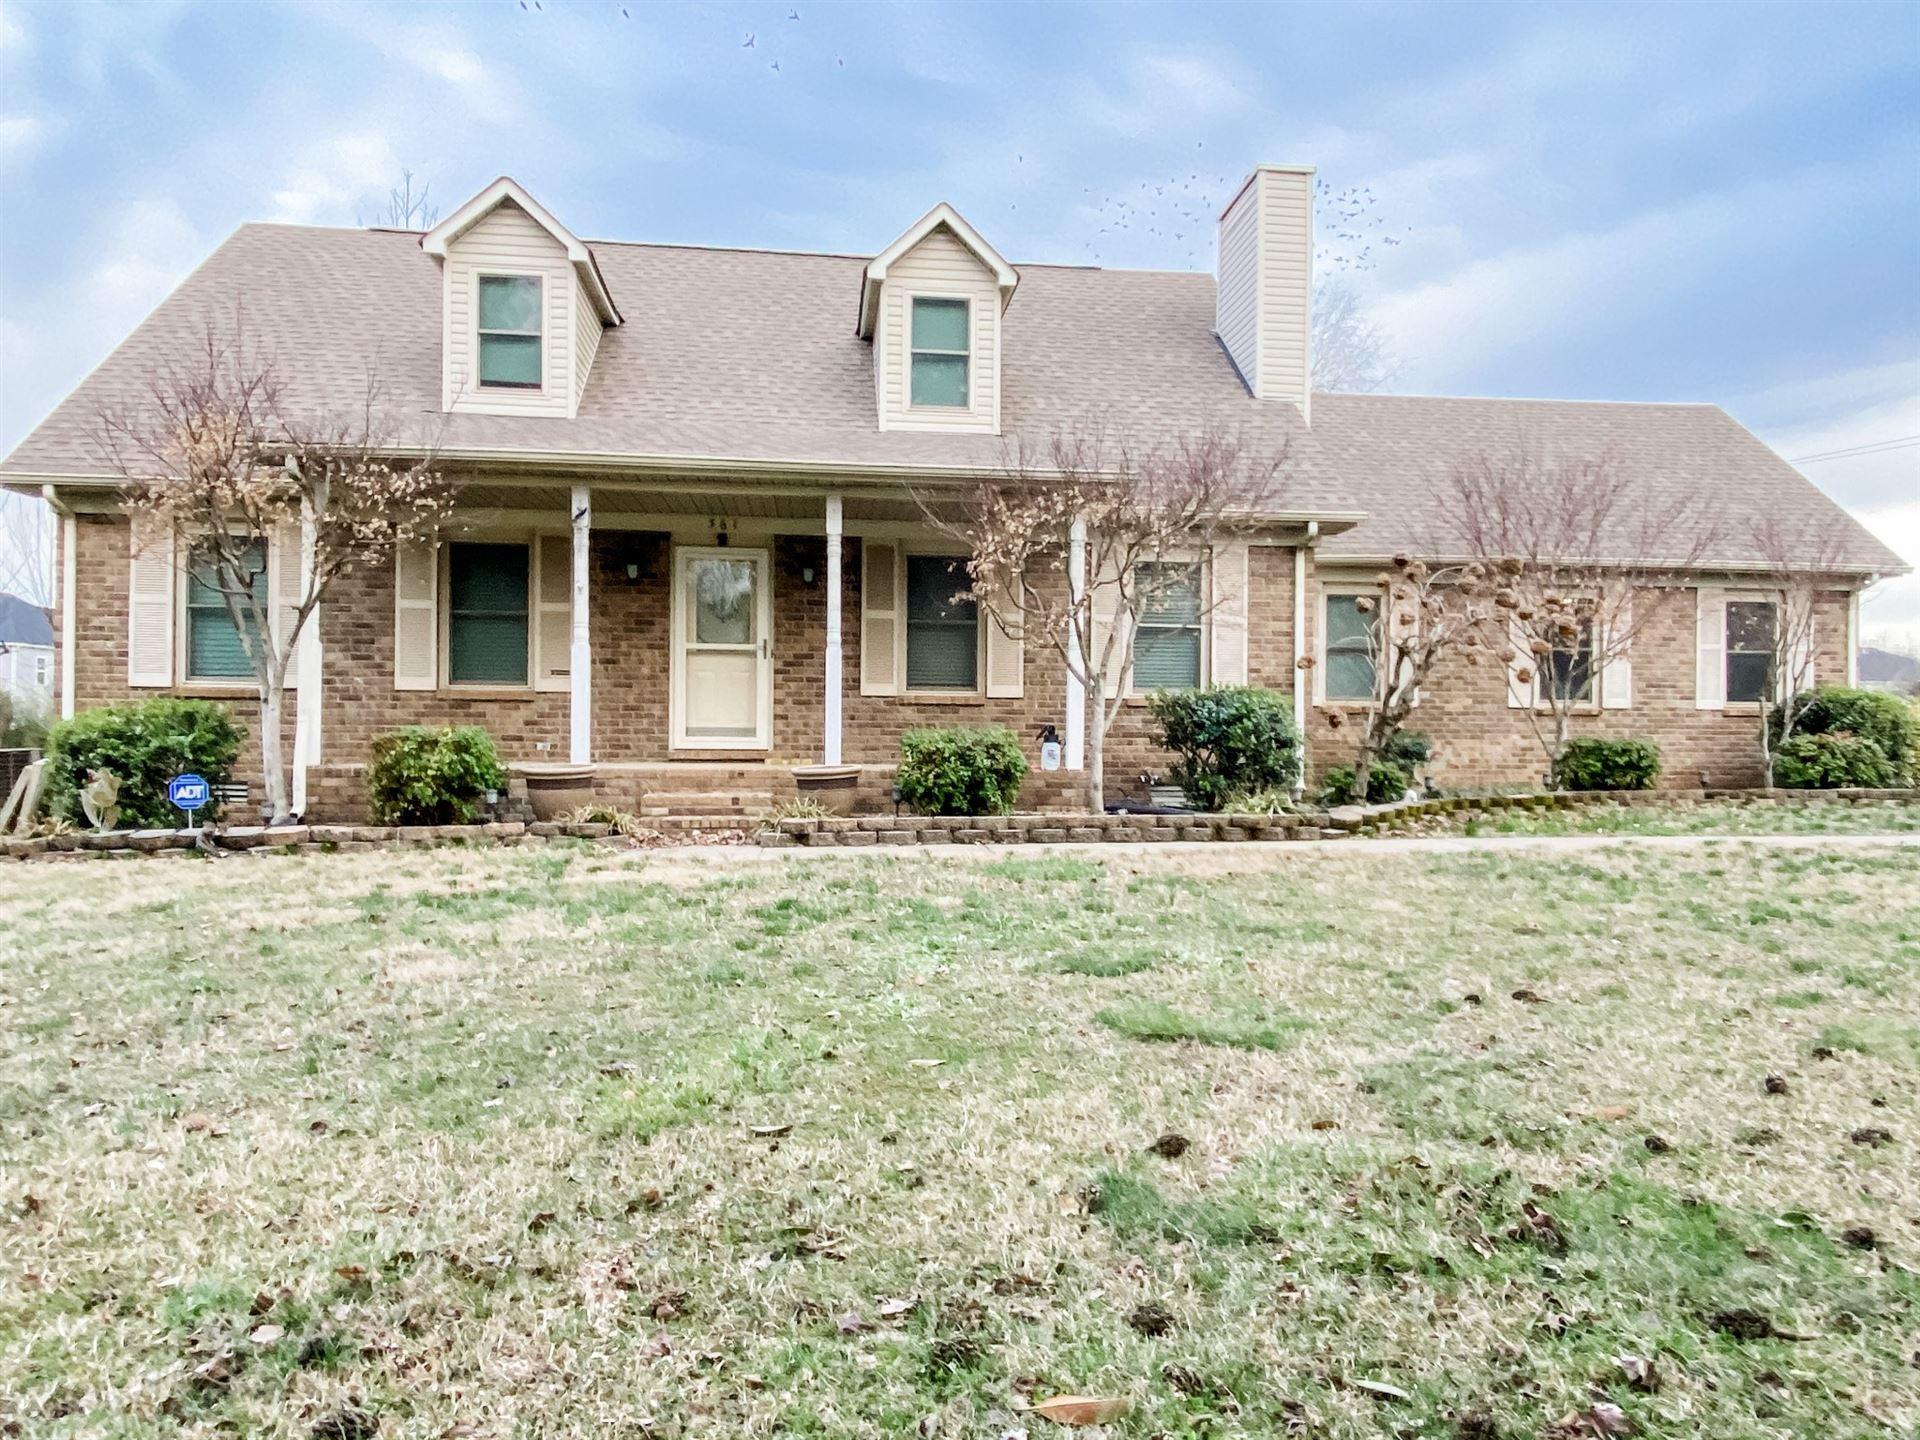 561 Sharondale Dr, Murfreesboro, TN 37129 - MLS#: 2232847